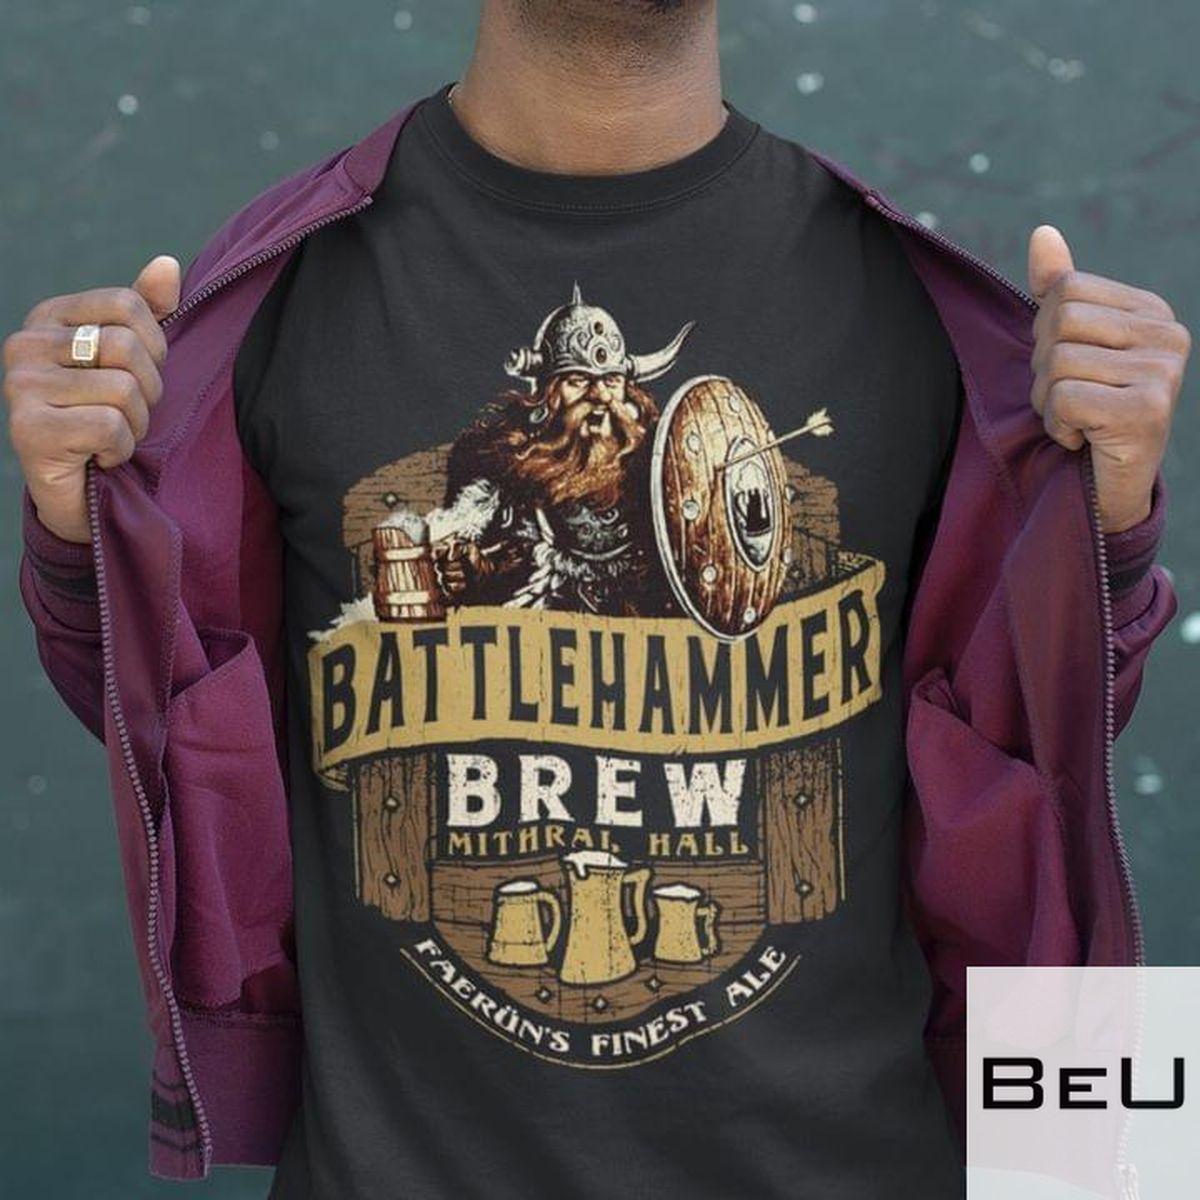 Battlehammer Brew Mithral Hall Faerun Finest Ale Shirtv